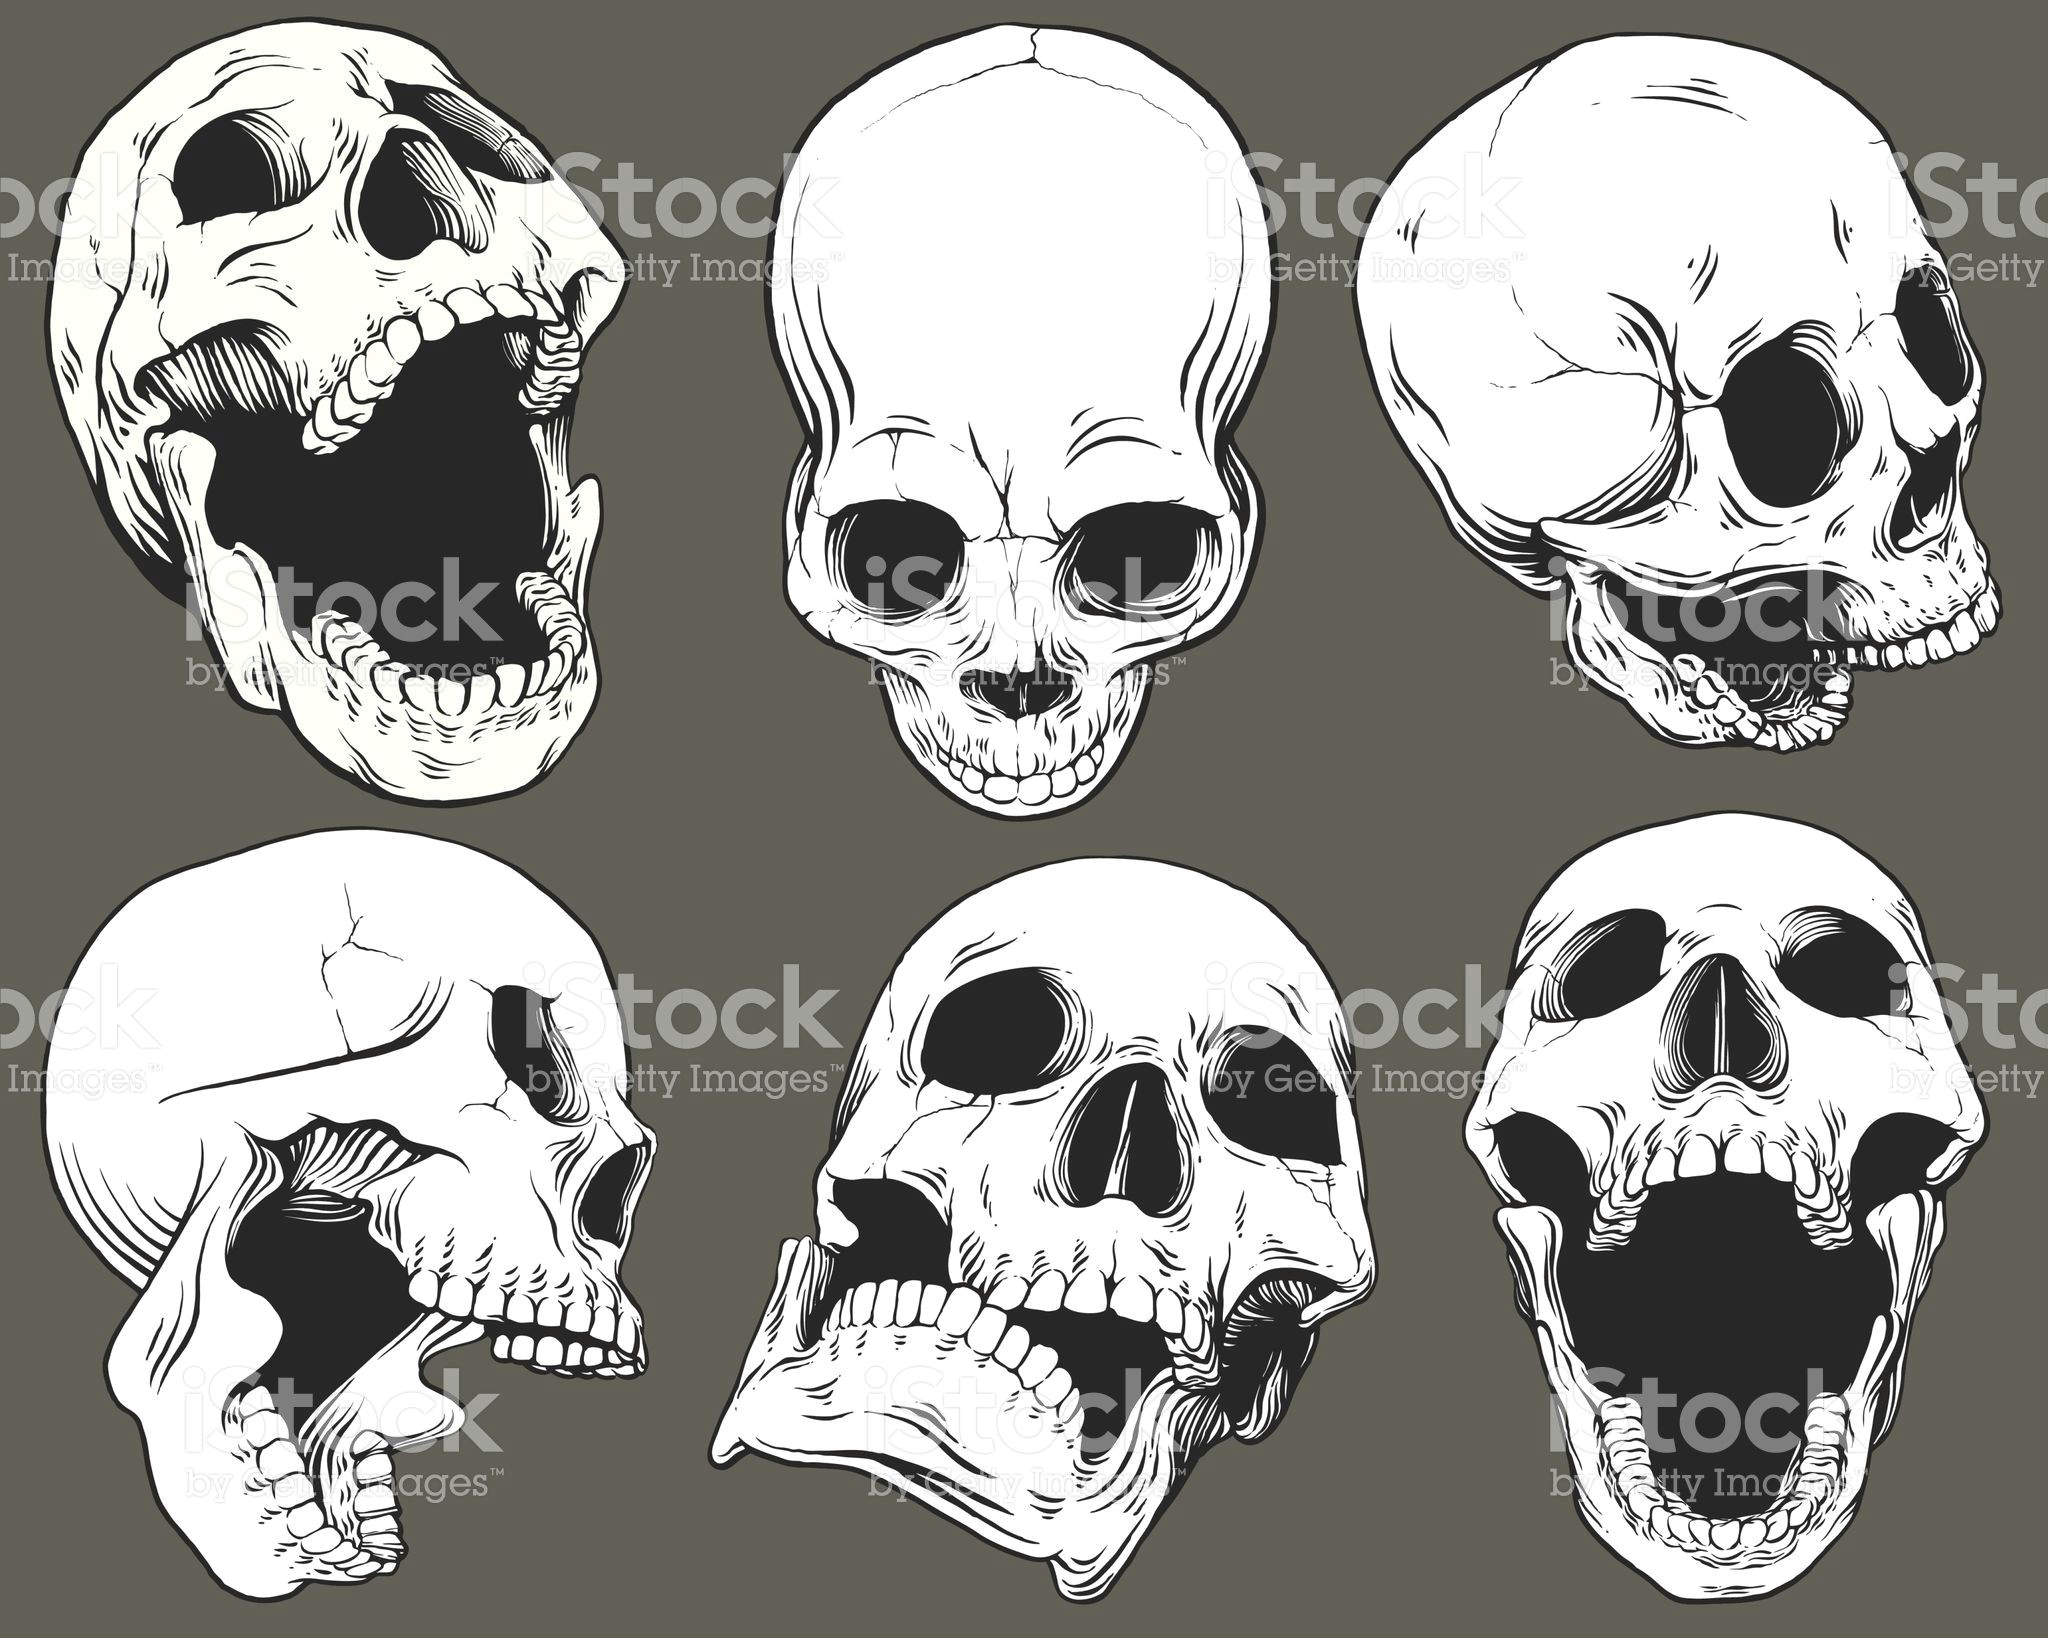 a a a a a a a a a a a a a a a a a a a a a a a aa a a a aa a a a c a a c ae drawing poses drawing heads